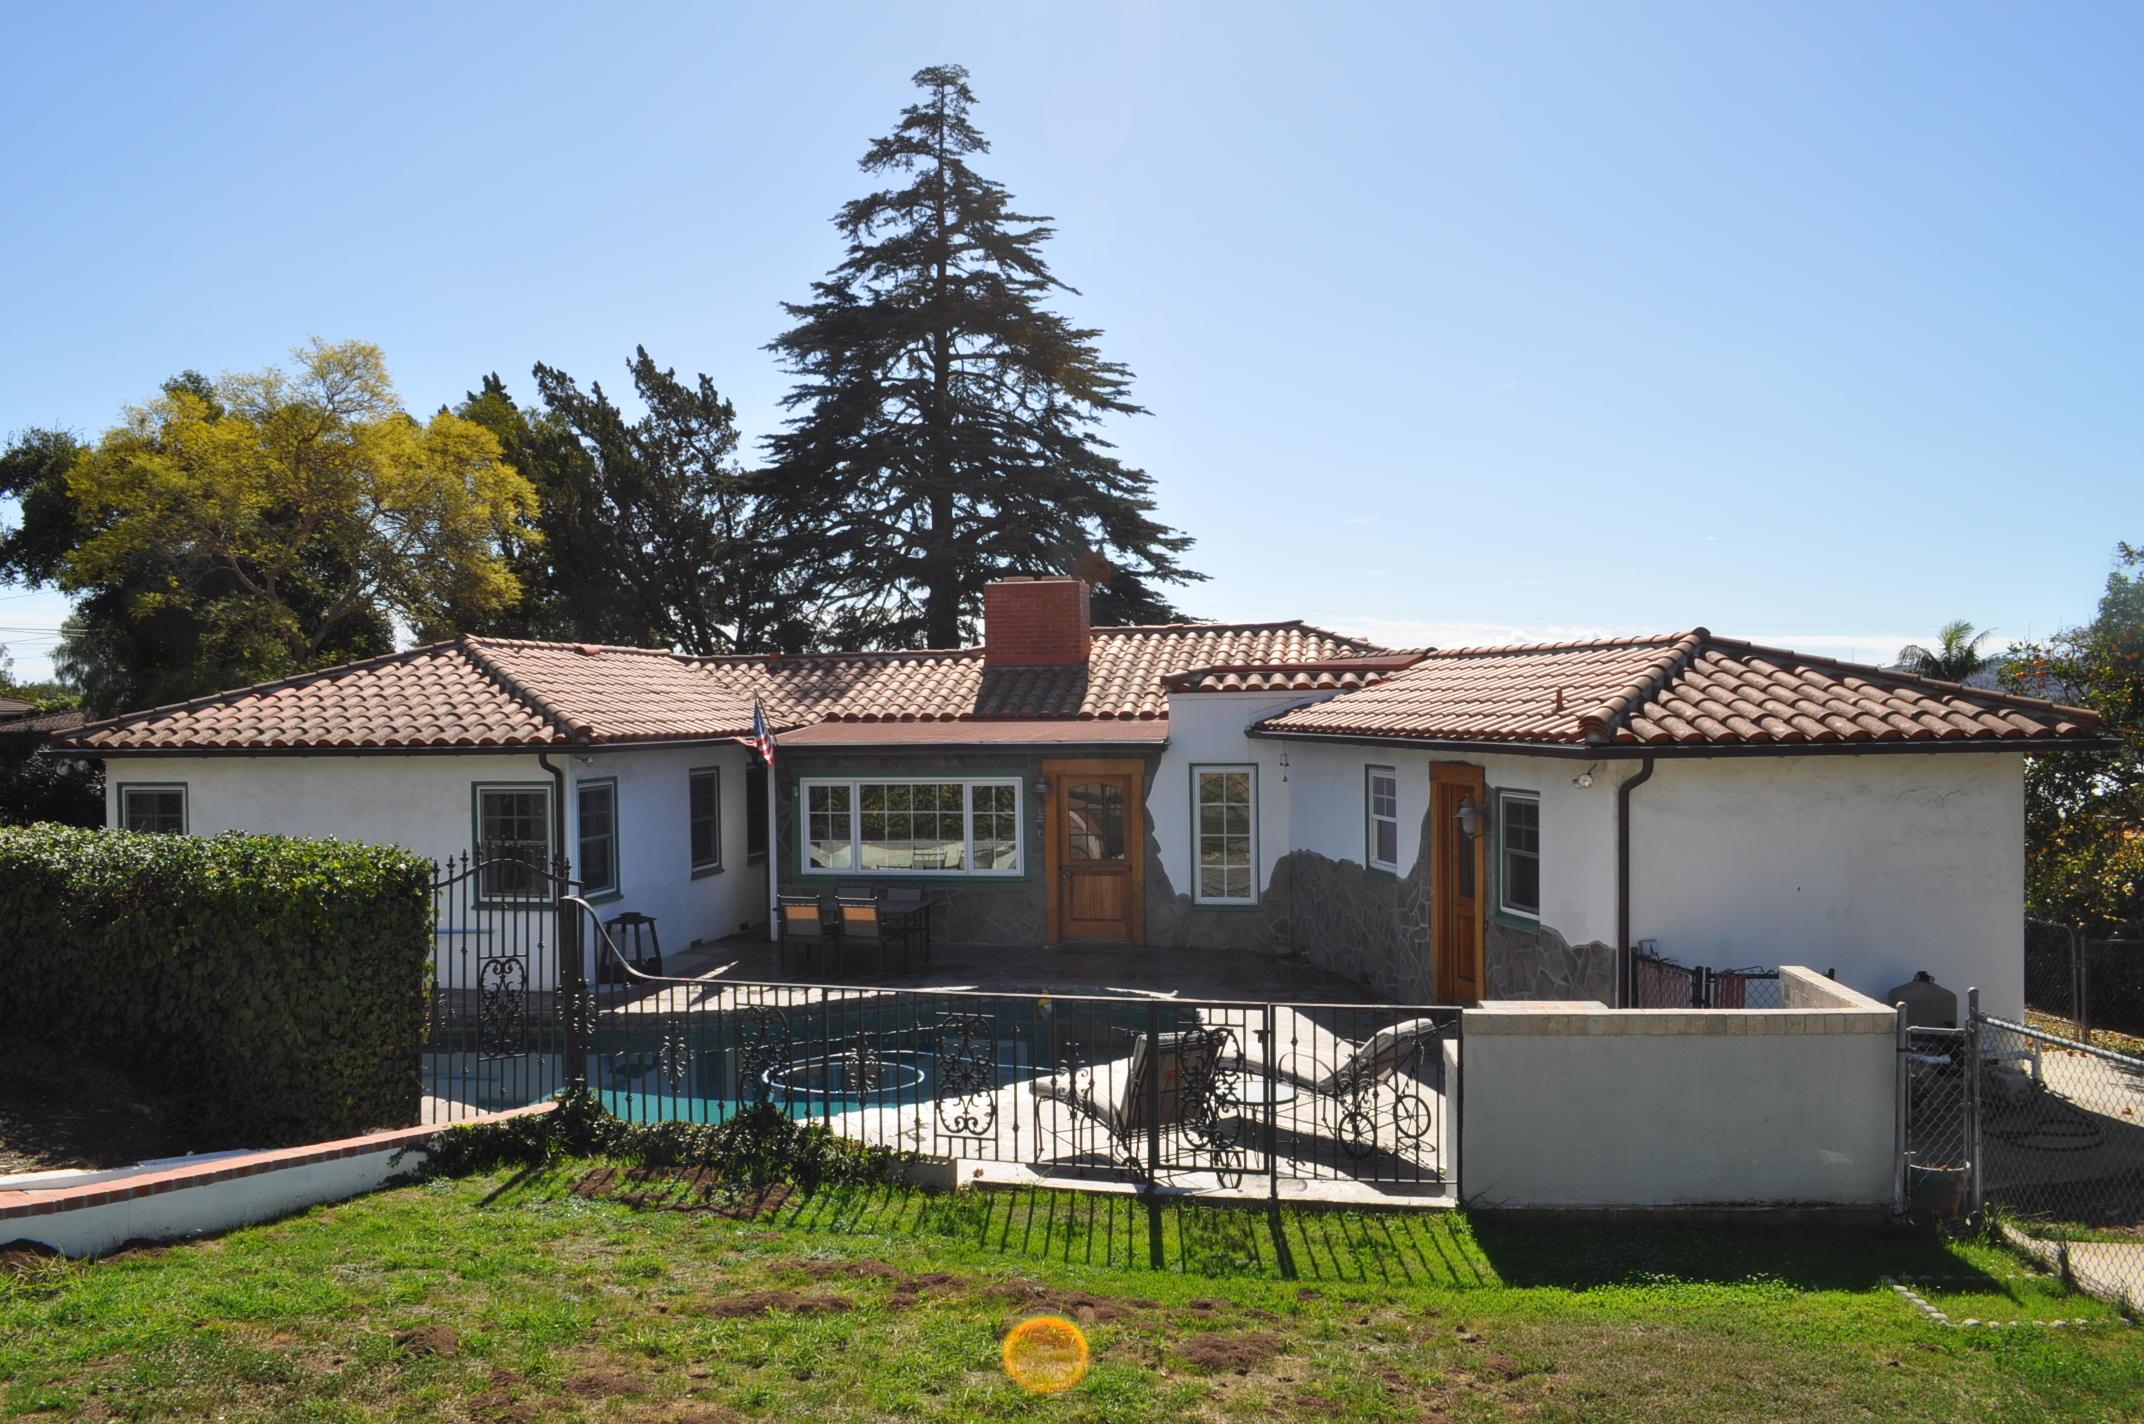 Property photo for 322 Piedmont Rd Santa Barbara, California 93105 - 18-523